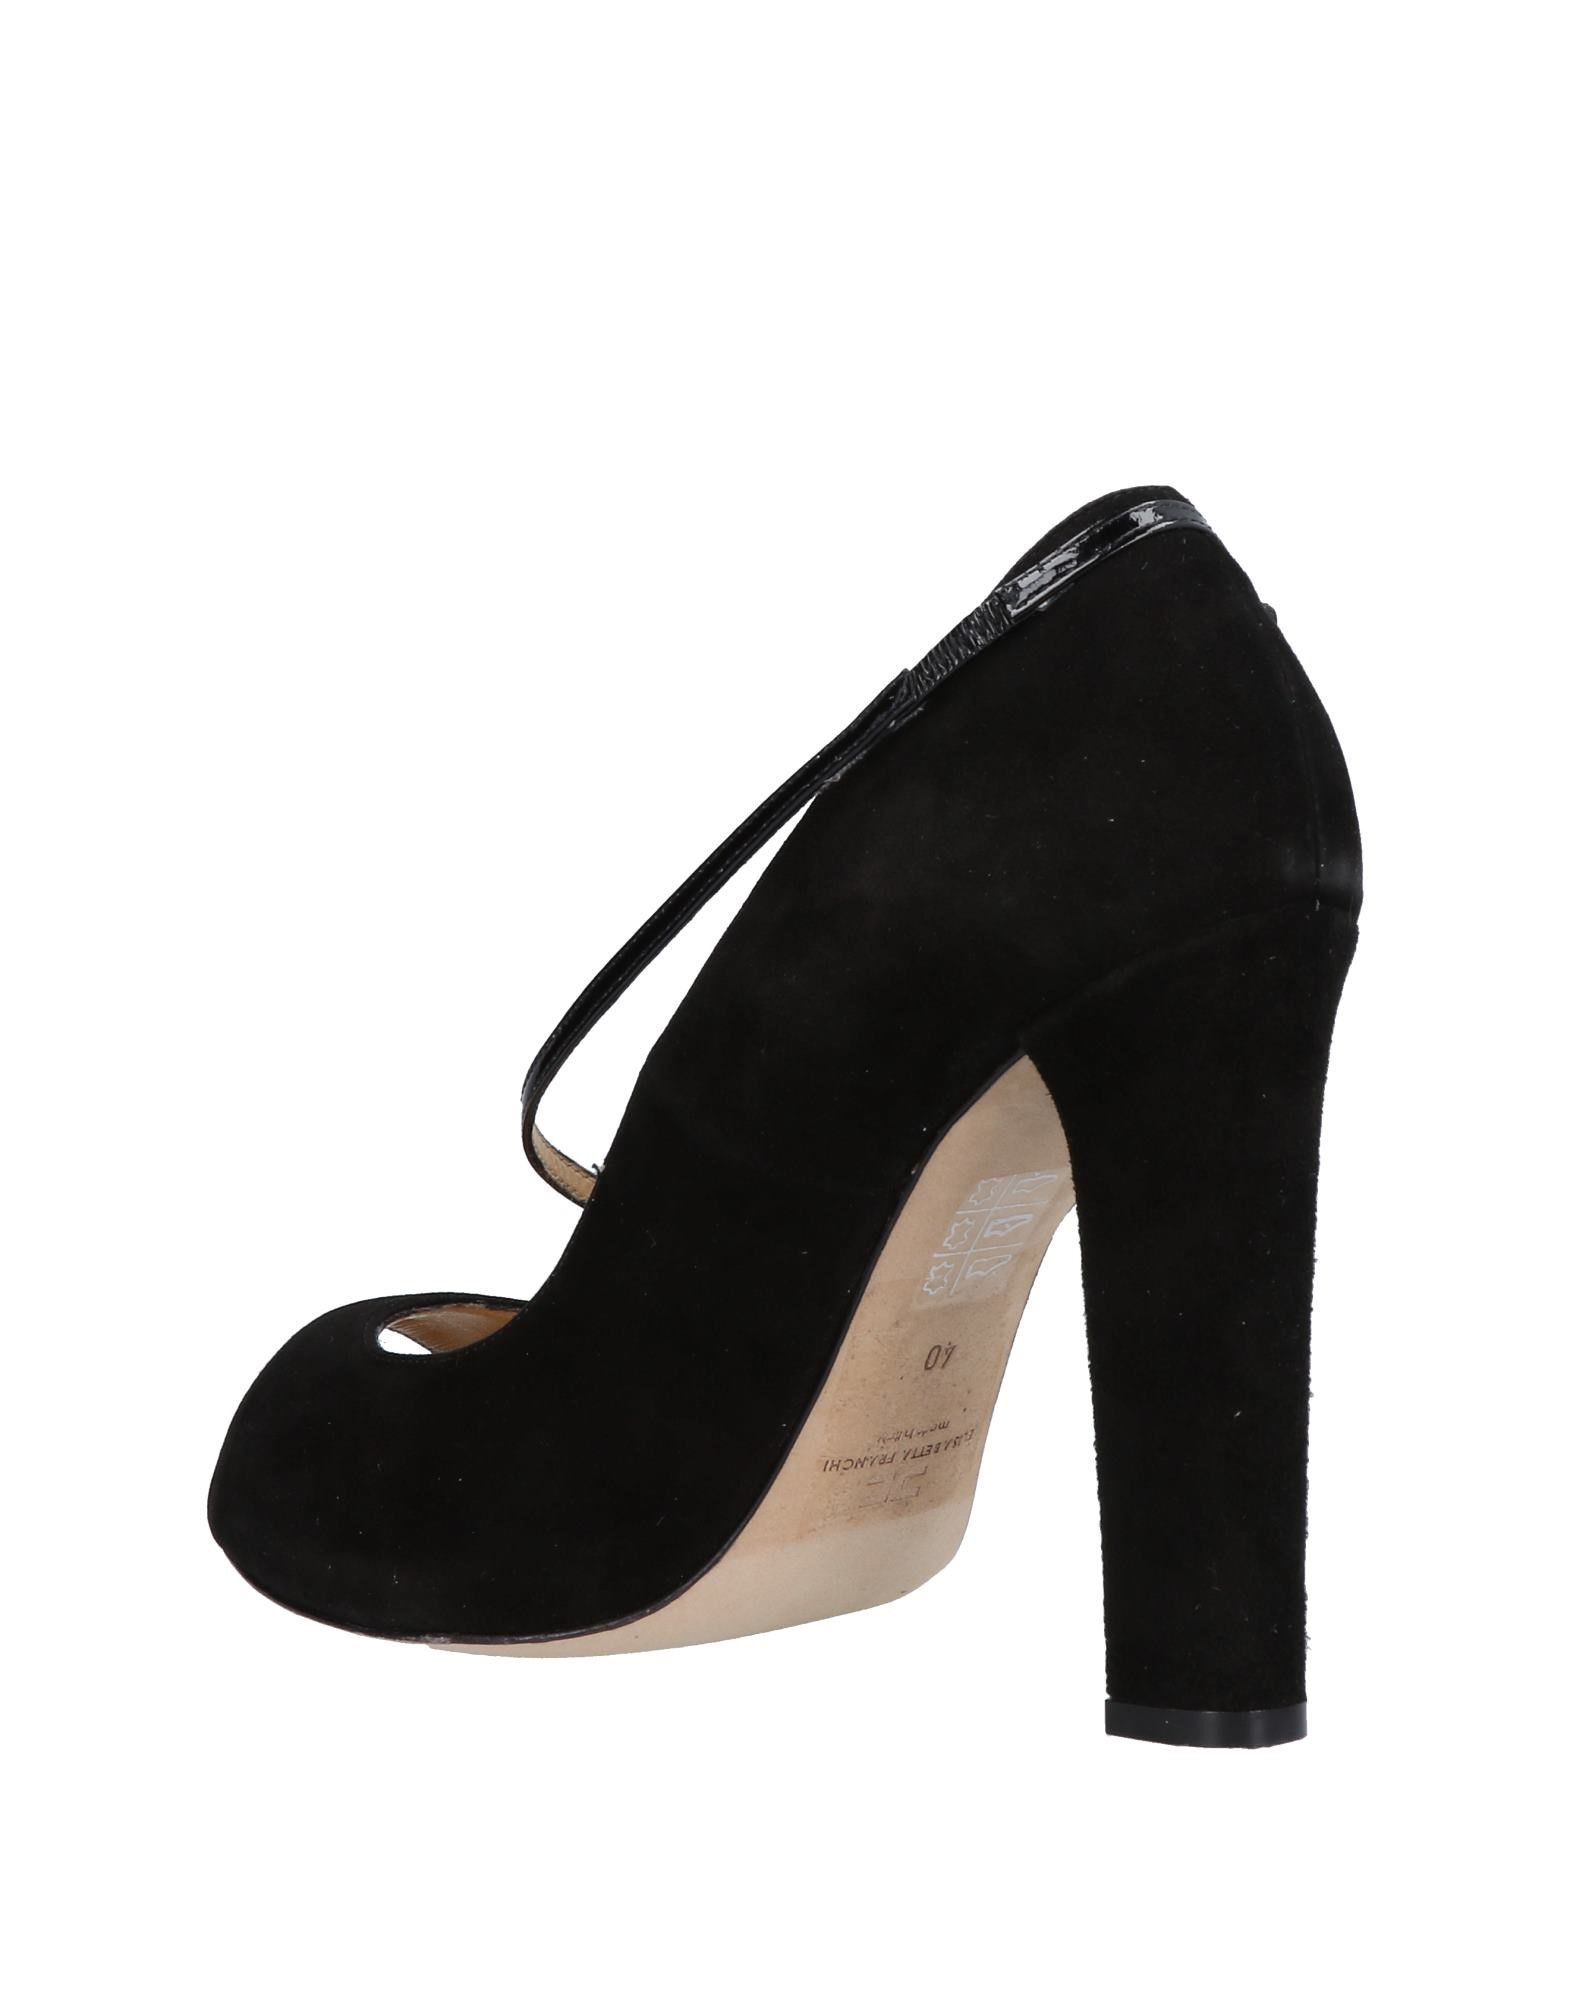 Stilvolle Pumps billige Schuhe Elisabetta Franchi Pumps Stilvolle Damen  11244384PE 97b98c